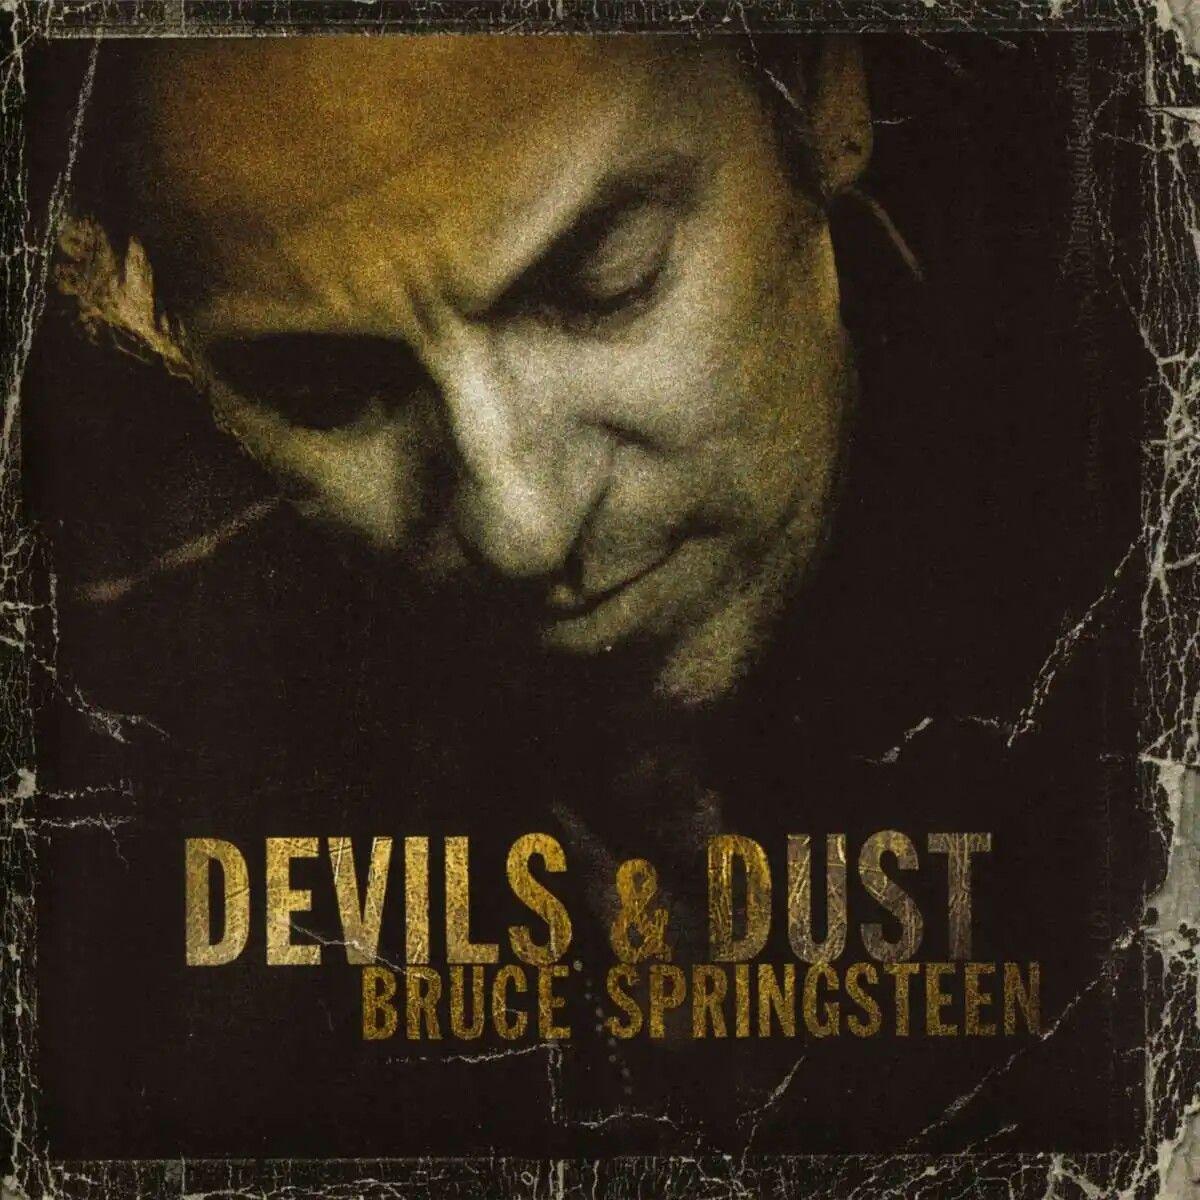 BRUCE SPRINGSTEEN_ Devils & Dust Bruce springsteen